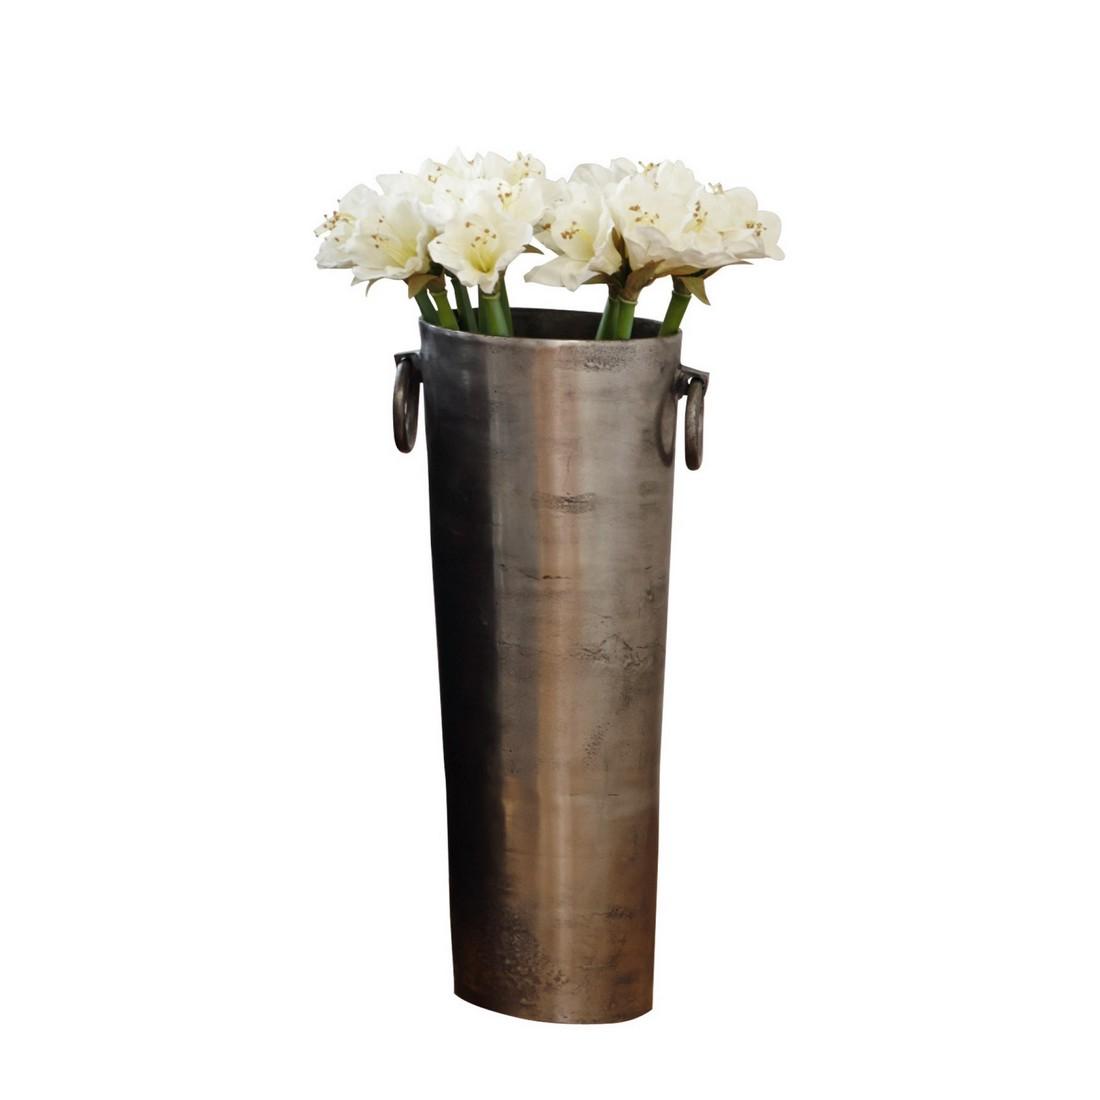 vase shanice aluminiumguss silber loberon g nstig online kaufen. Black Bedroom Furniture Sets. Home Design Ideas